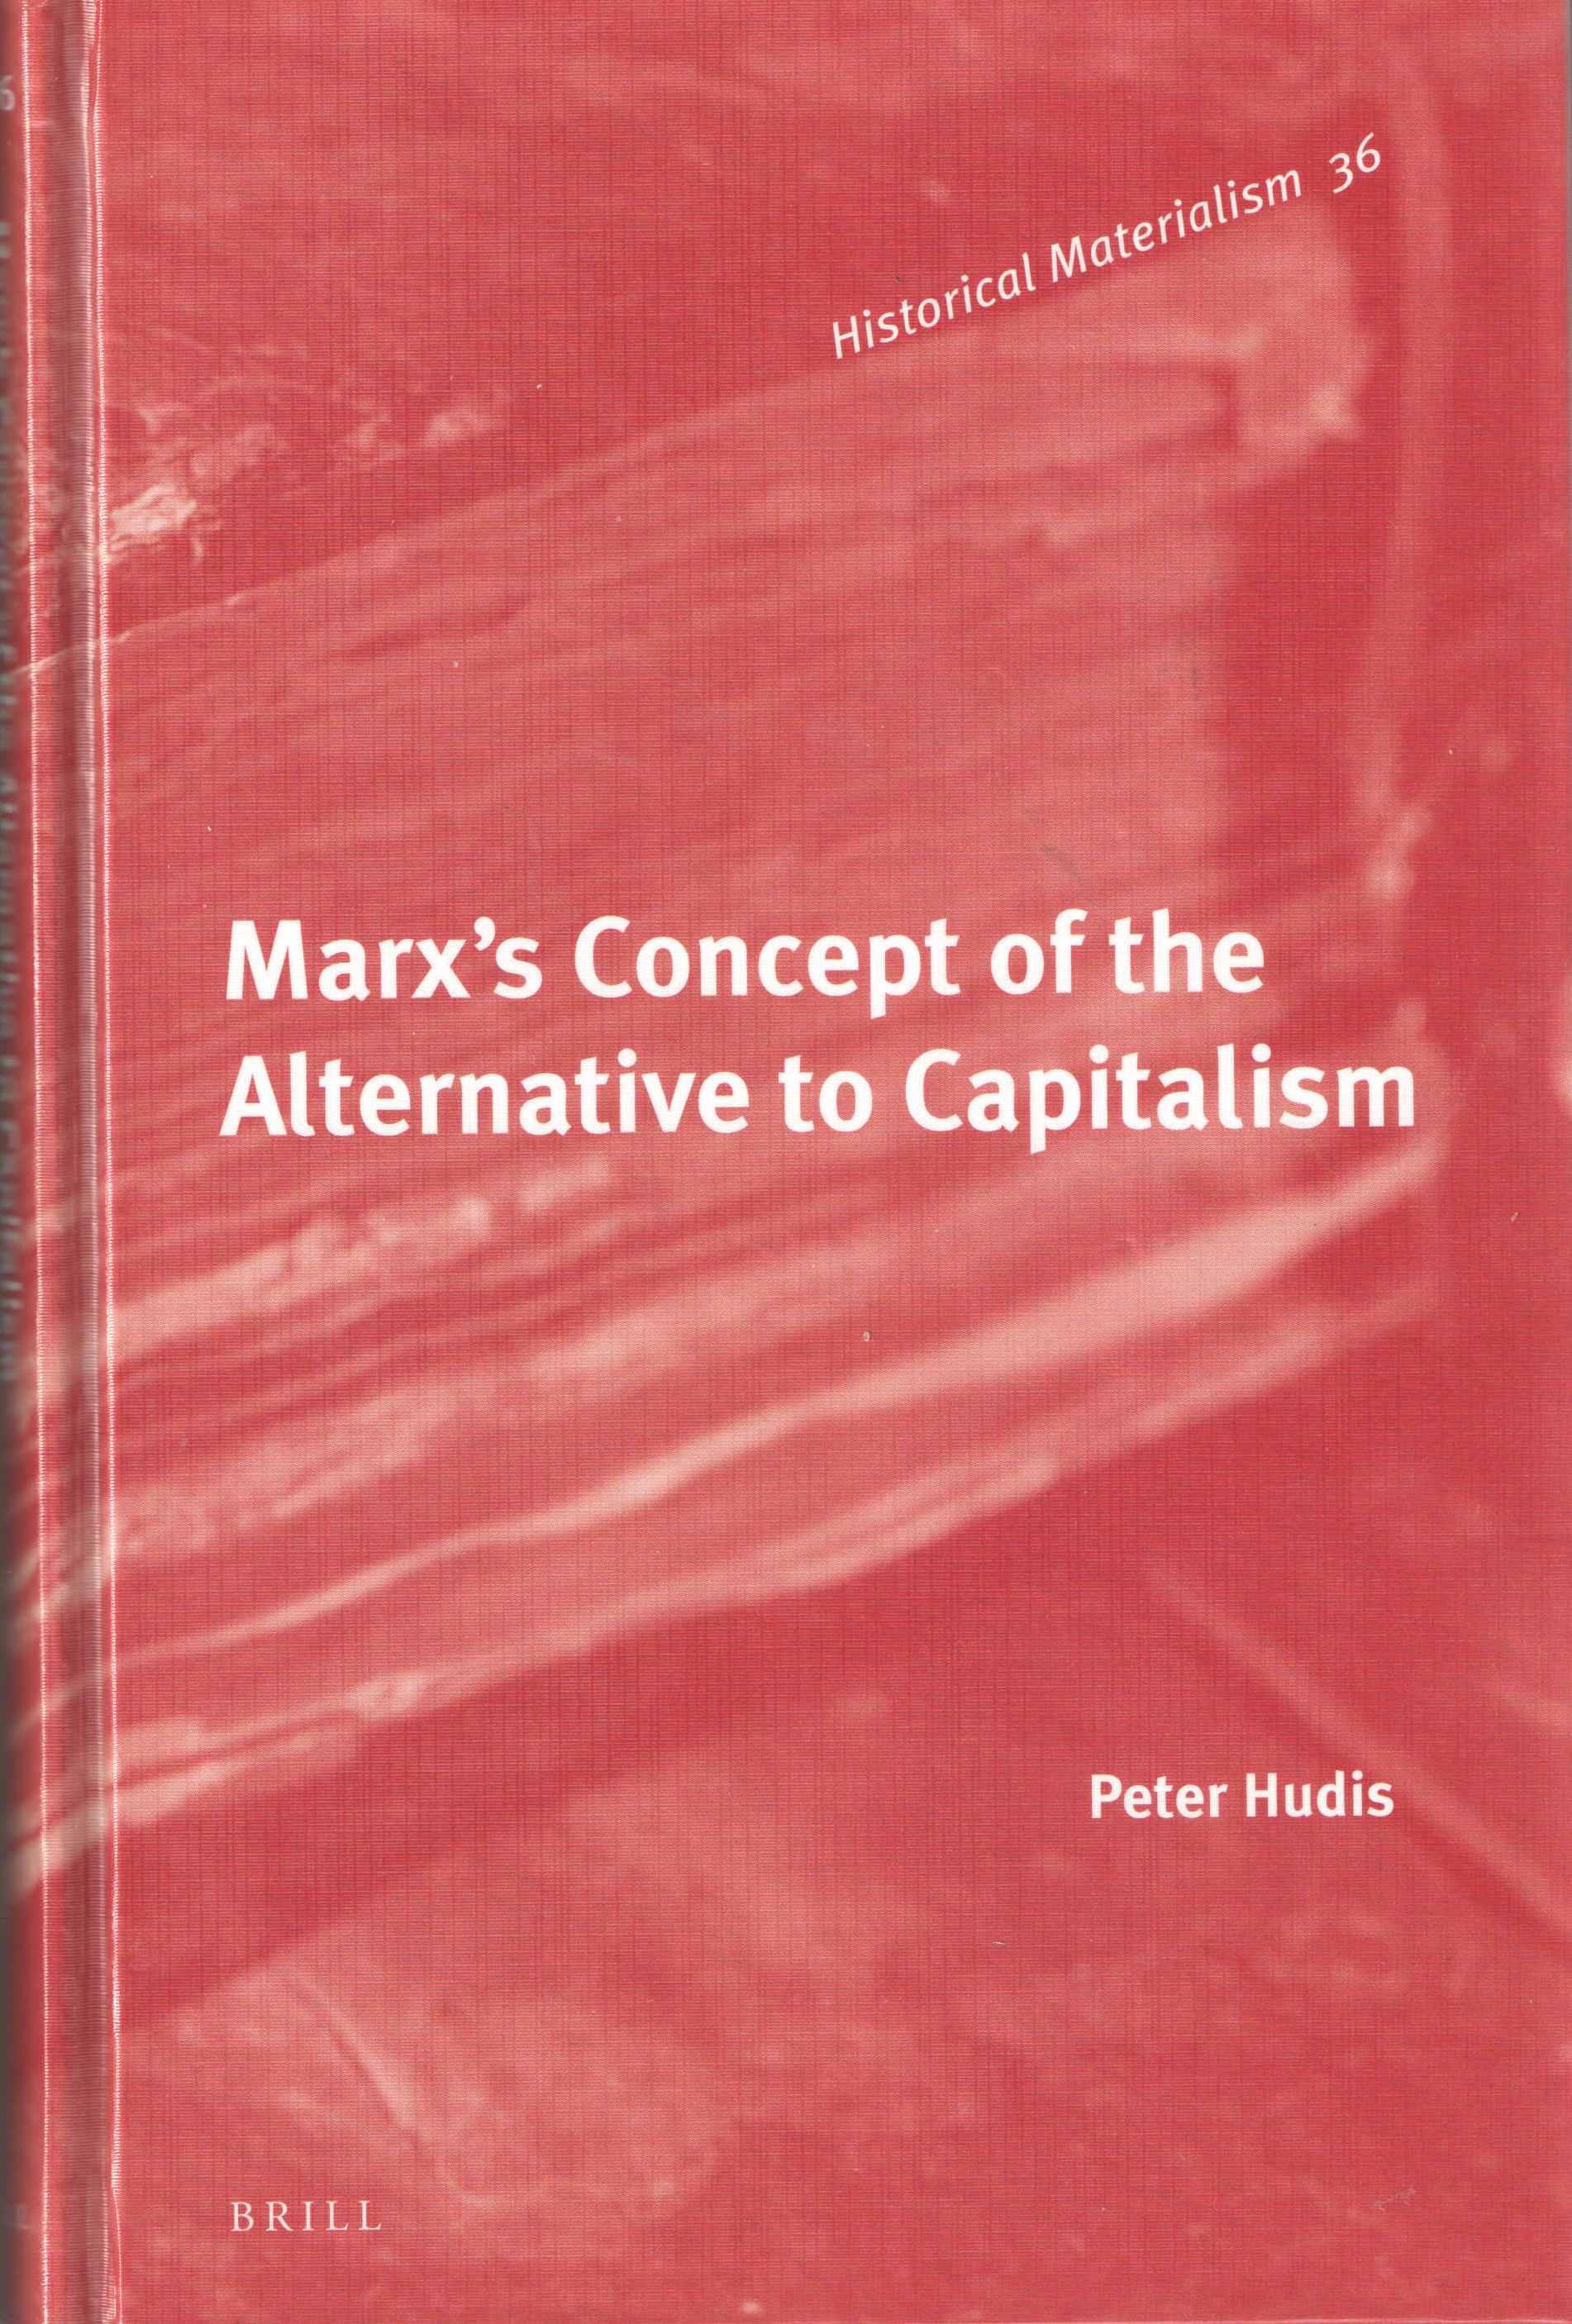 Pdf Econophysics And Economics Of